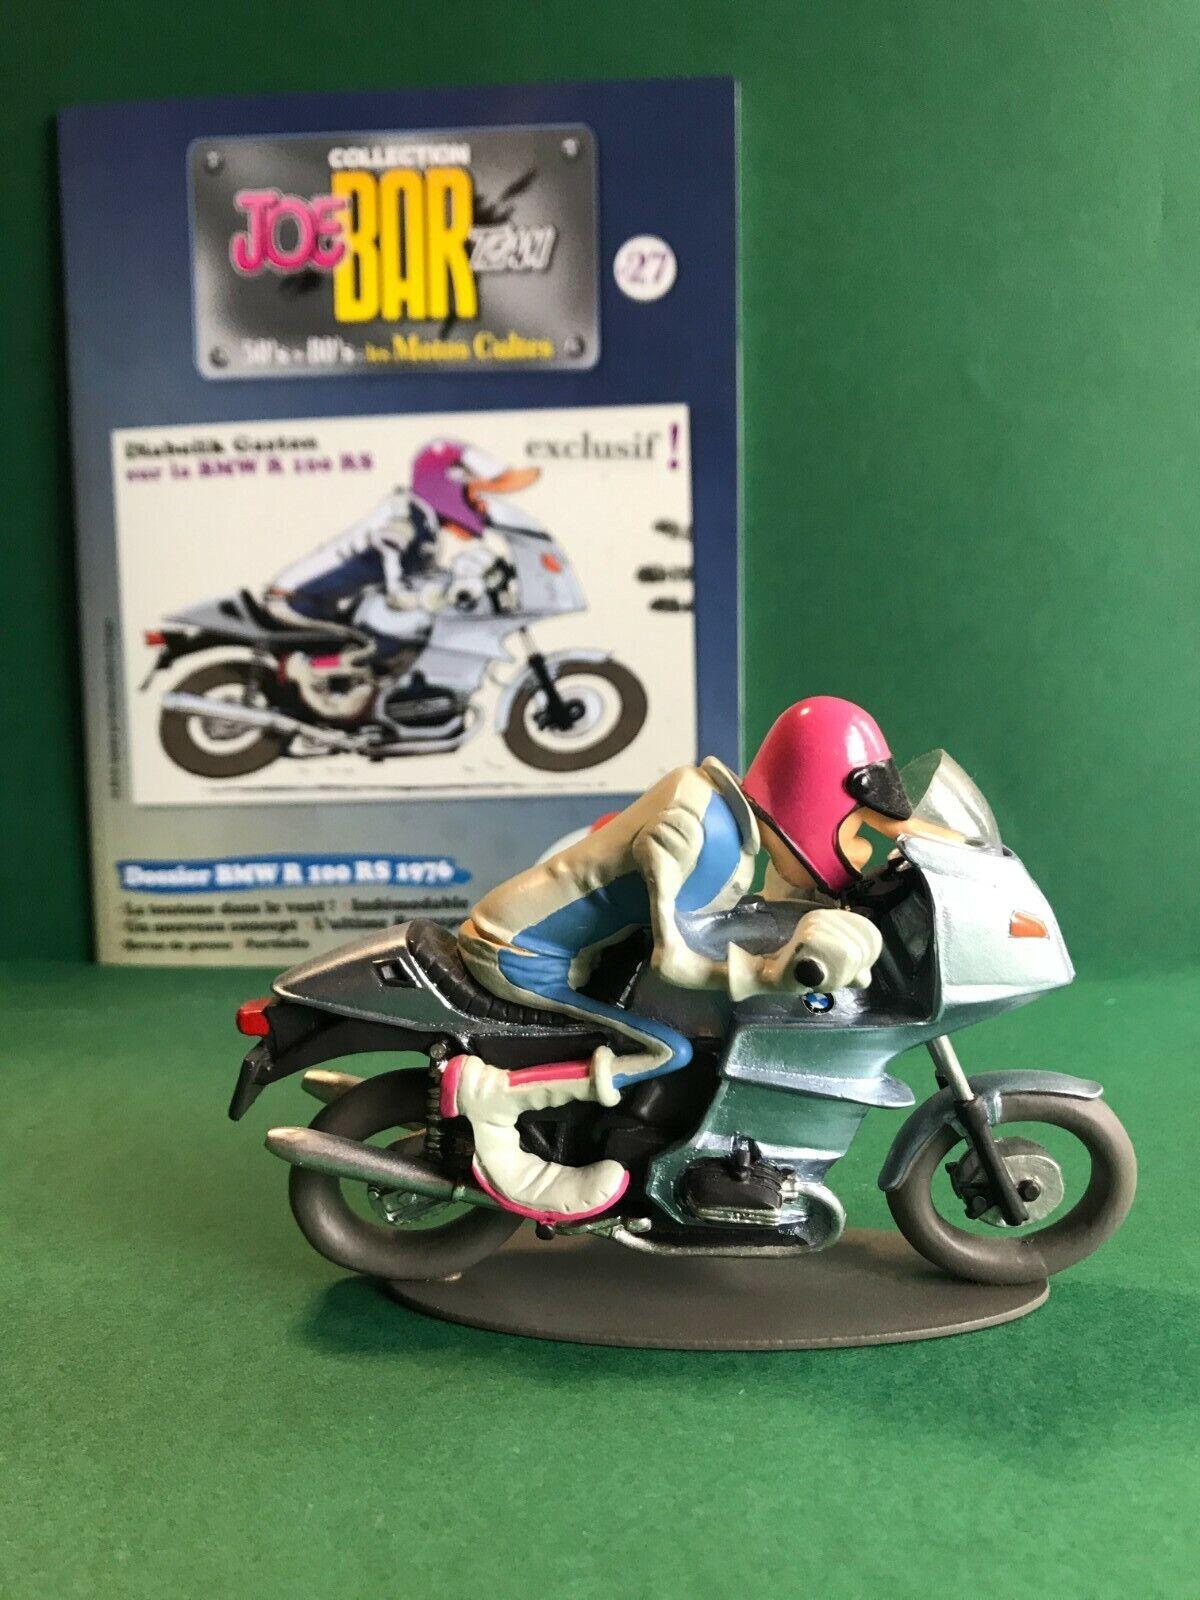 Figurine joe bar team & livret moto bmw r 100 rs